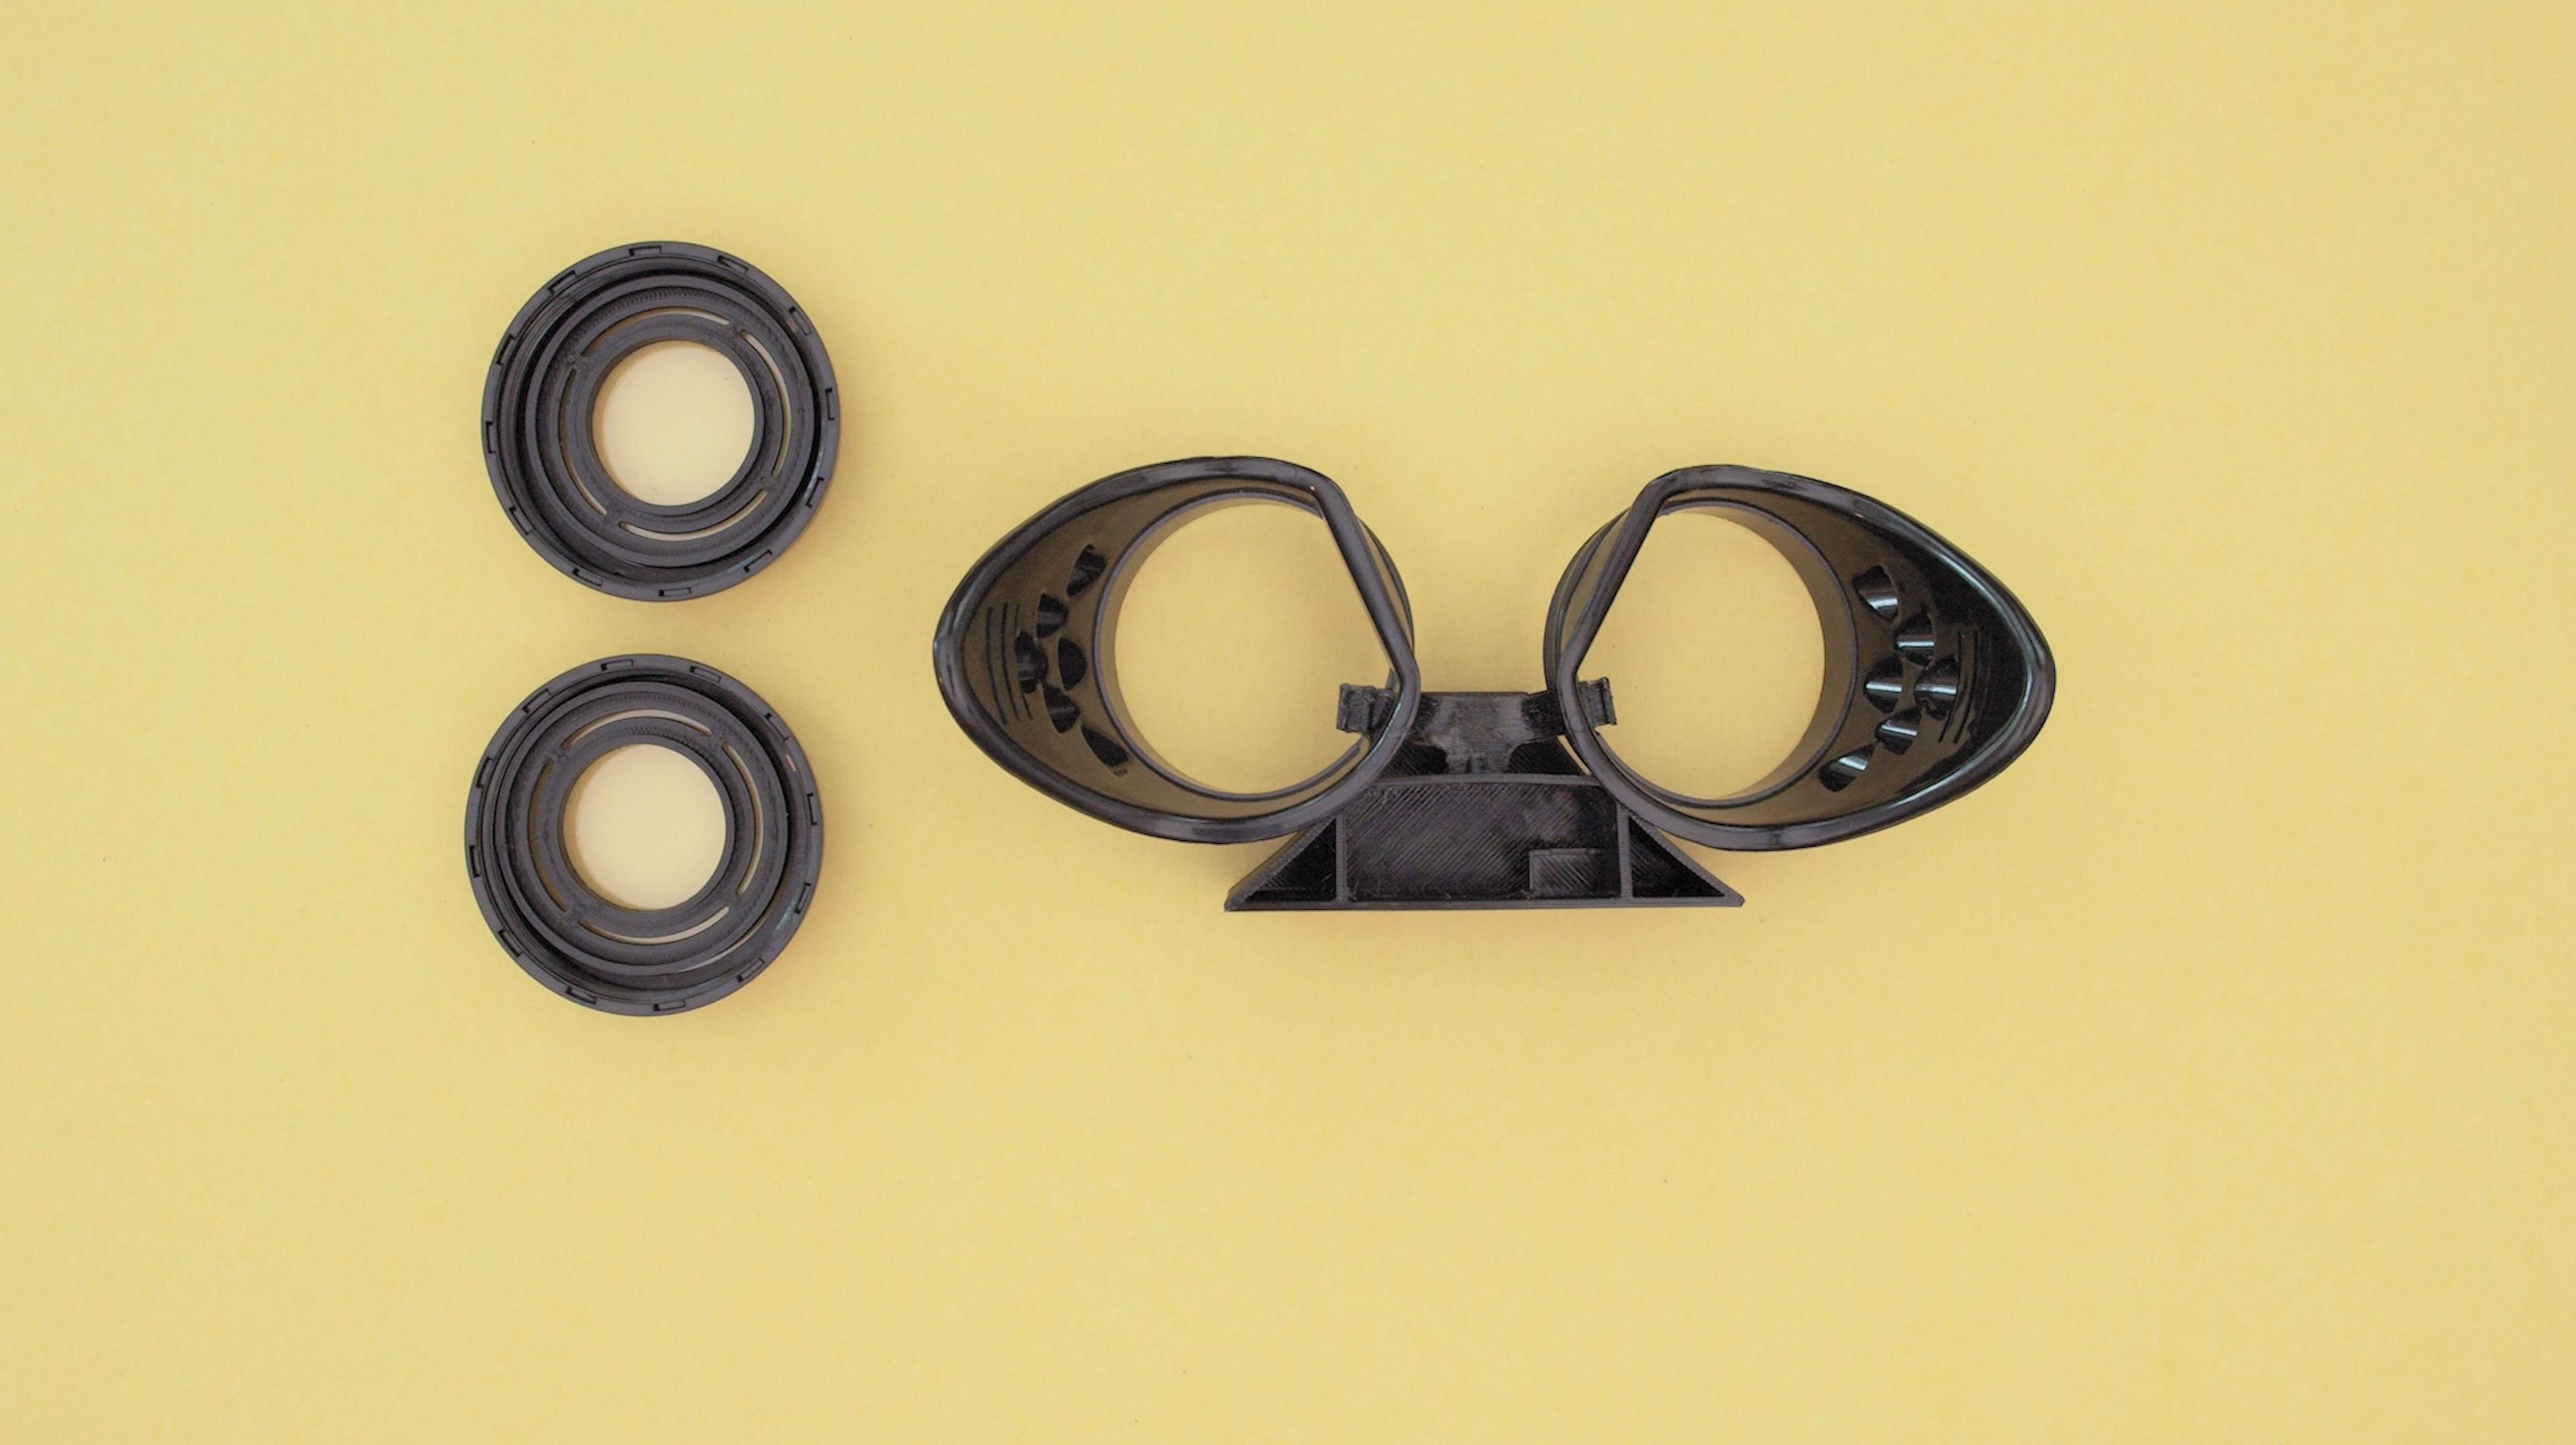 3d_printing_goggle-ring-holder.jpg